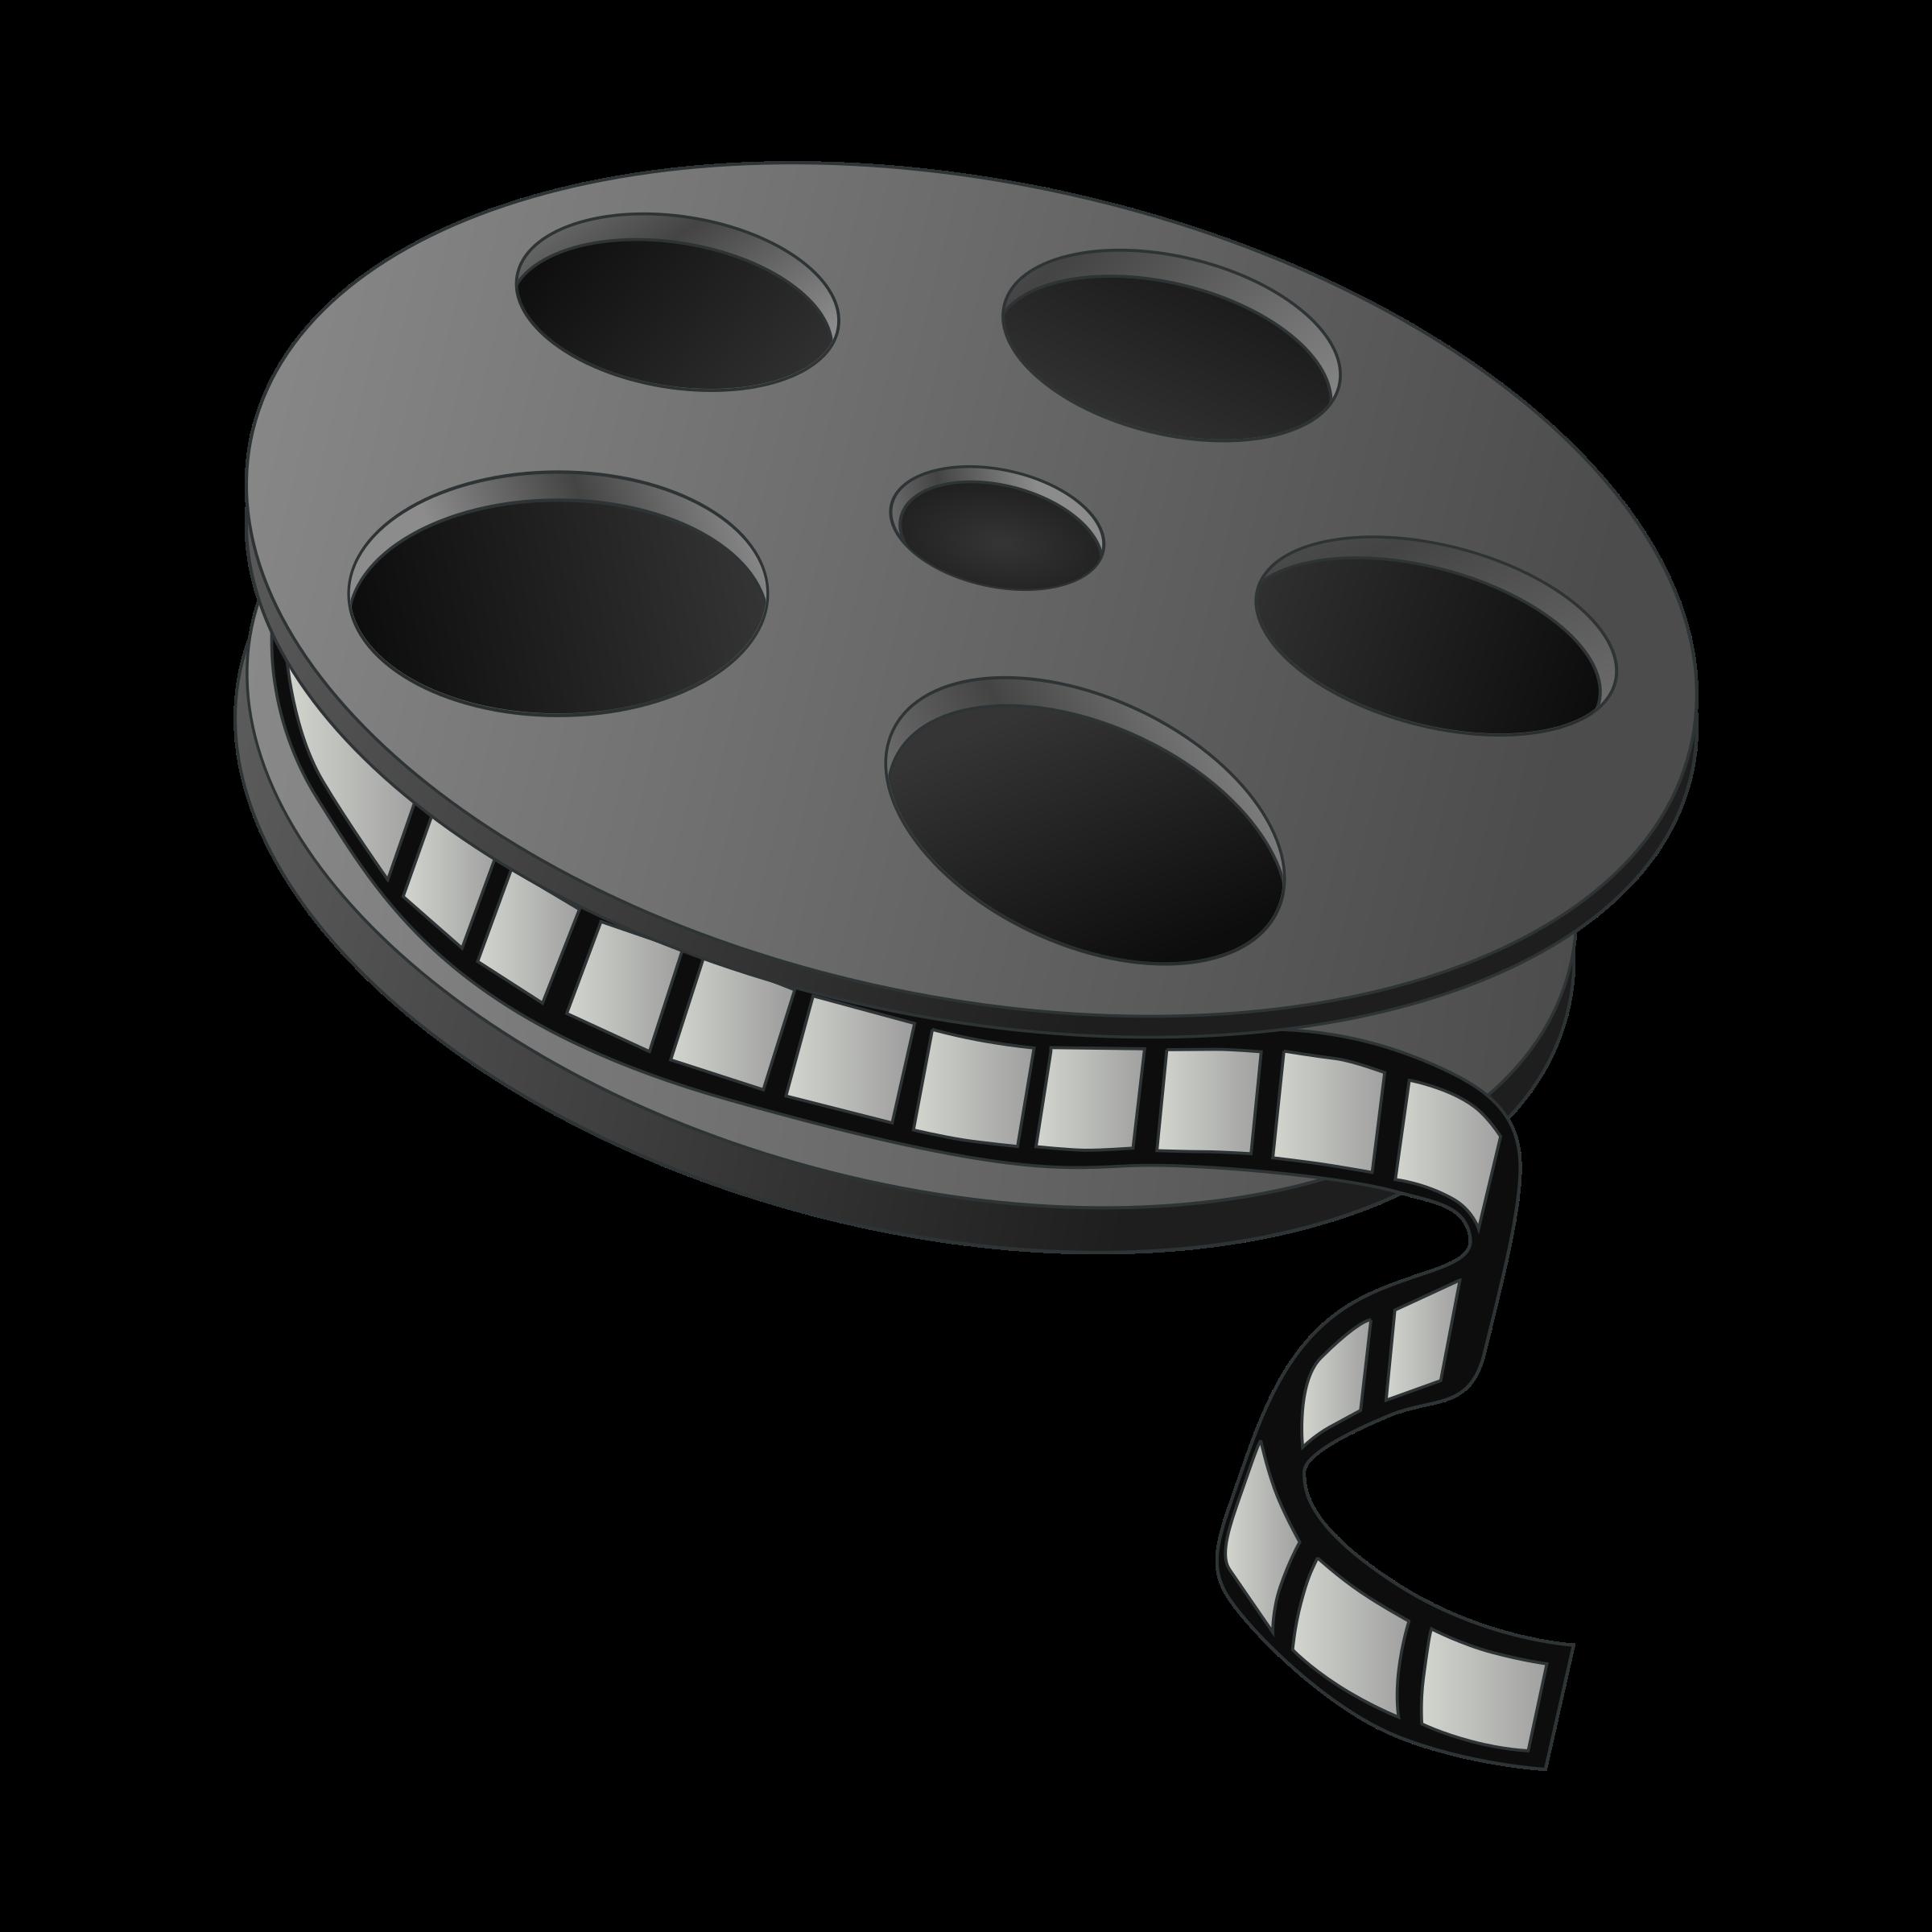 Reel big image png. Tool clipart movie